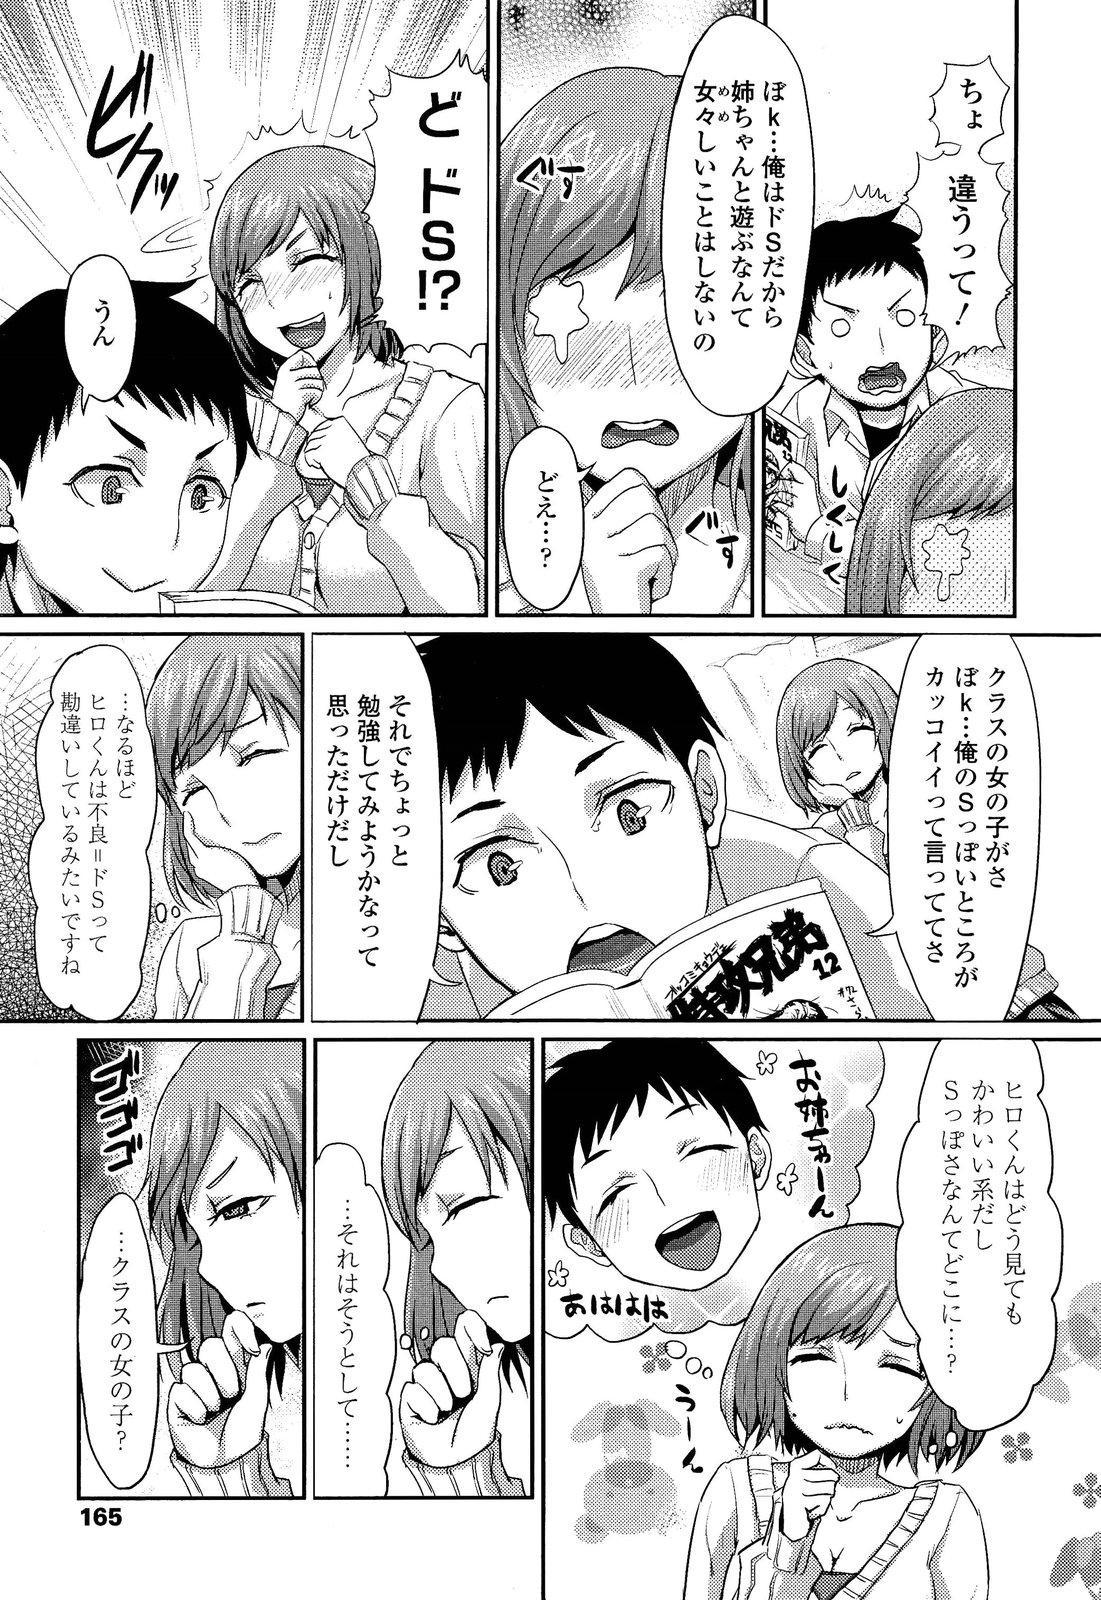 Girls forM Vol. 02 164